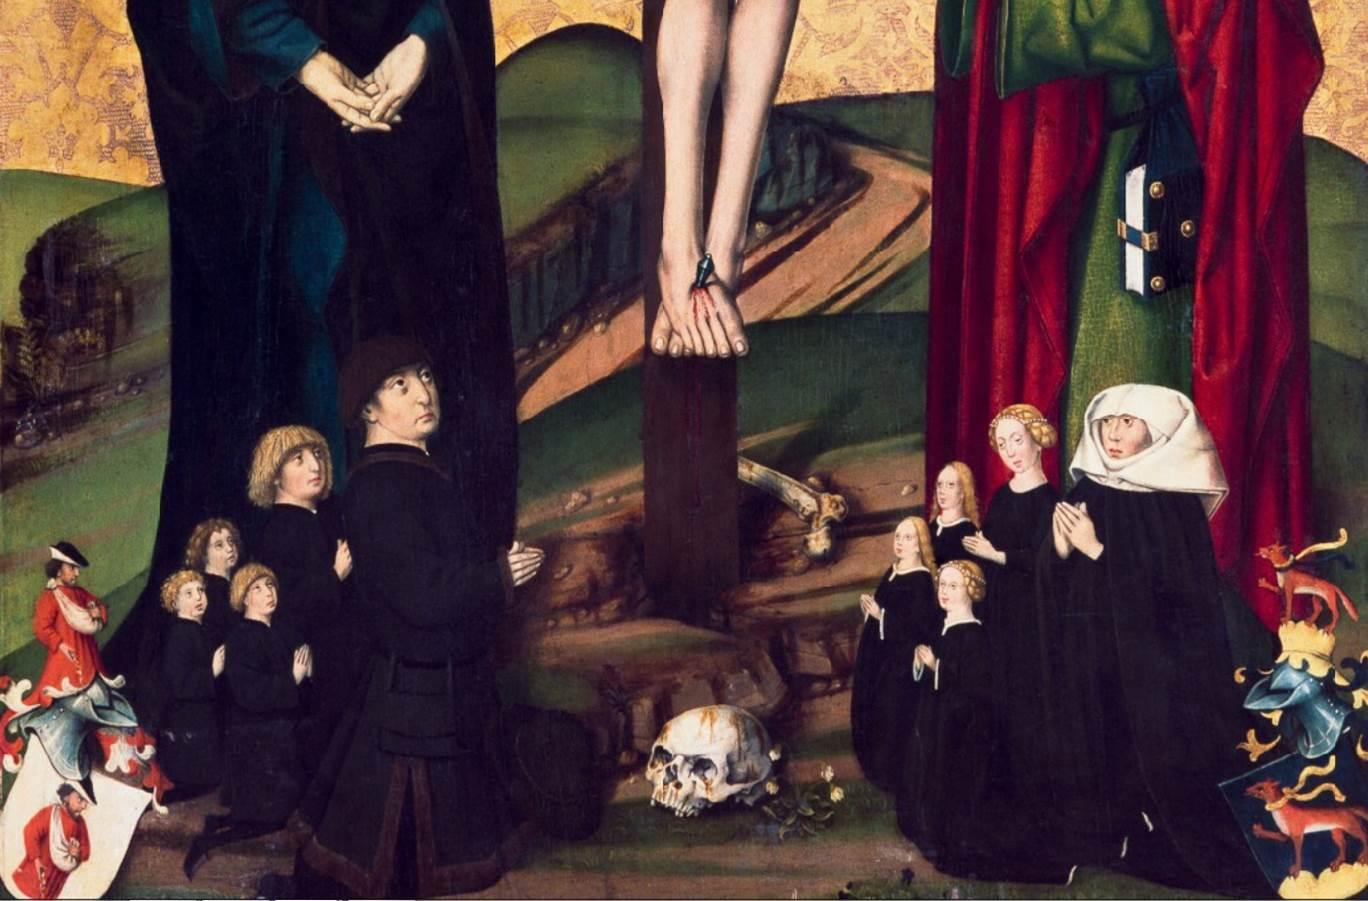 Kreuzigung Christi, Nördlingen, Stadtmuseum, 1462.